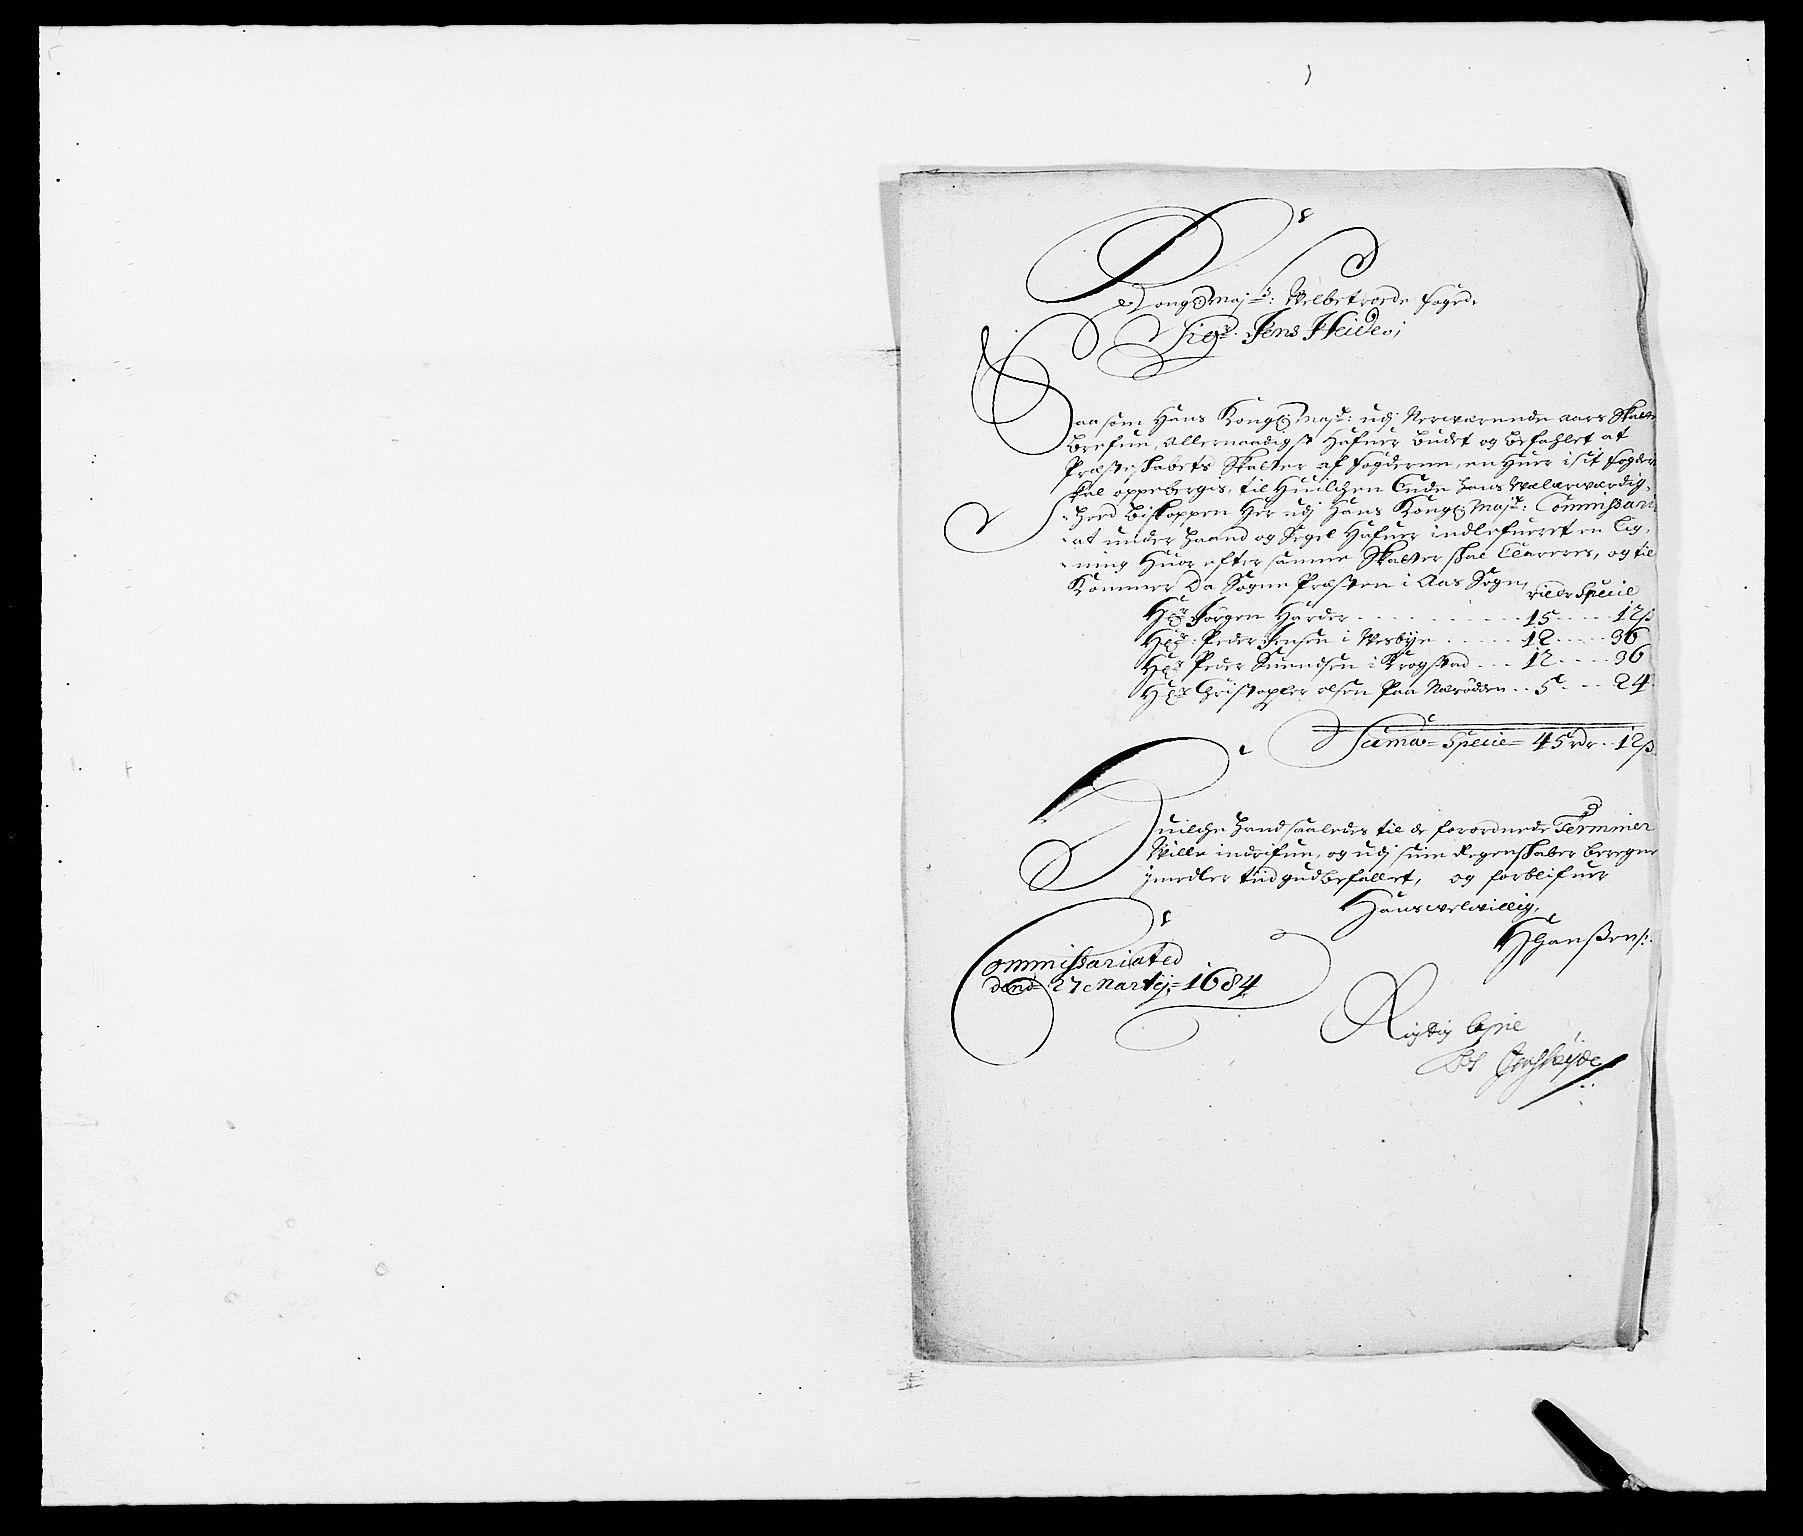 RA, Rentekammeret inntil 1814, Reviderte regnskaper, Fogderegnskap, R09/L0431: Fogderegnskap Follo, 1684, s. 222